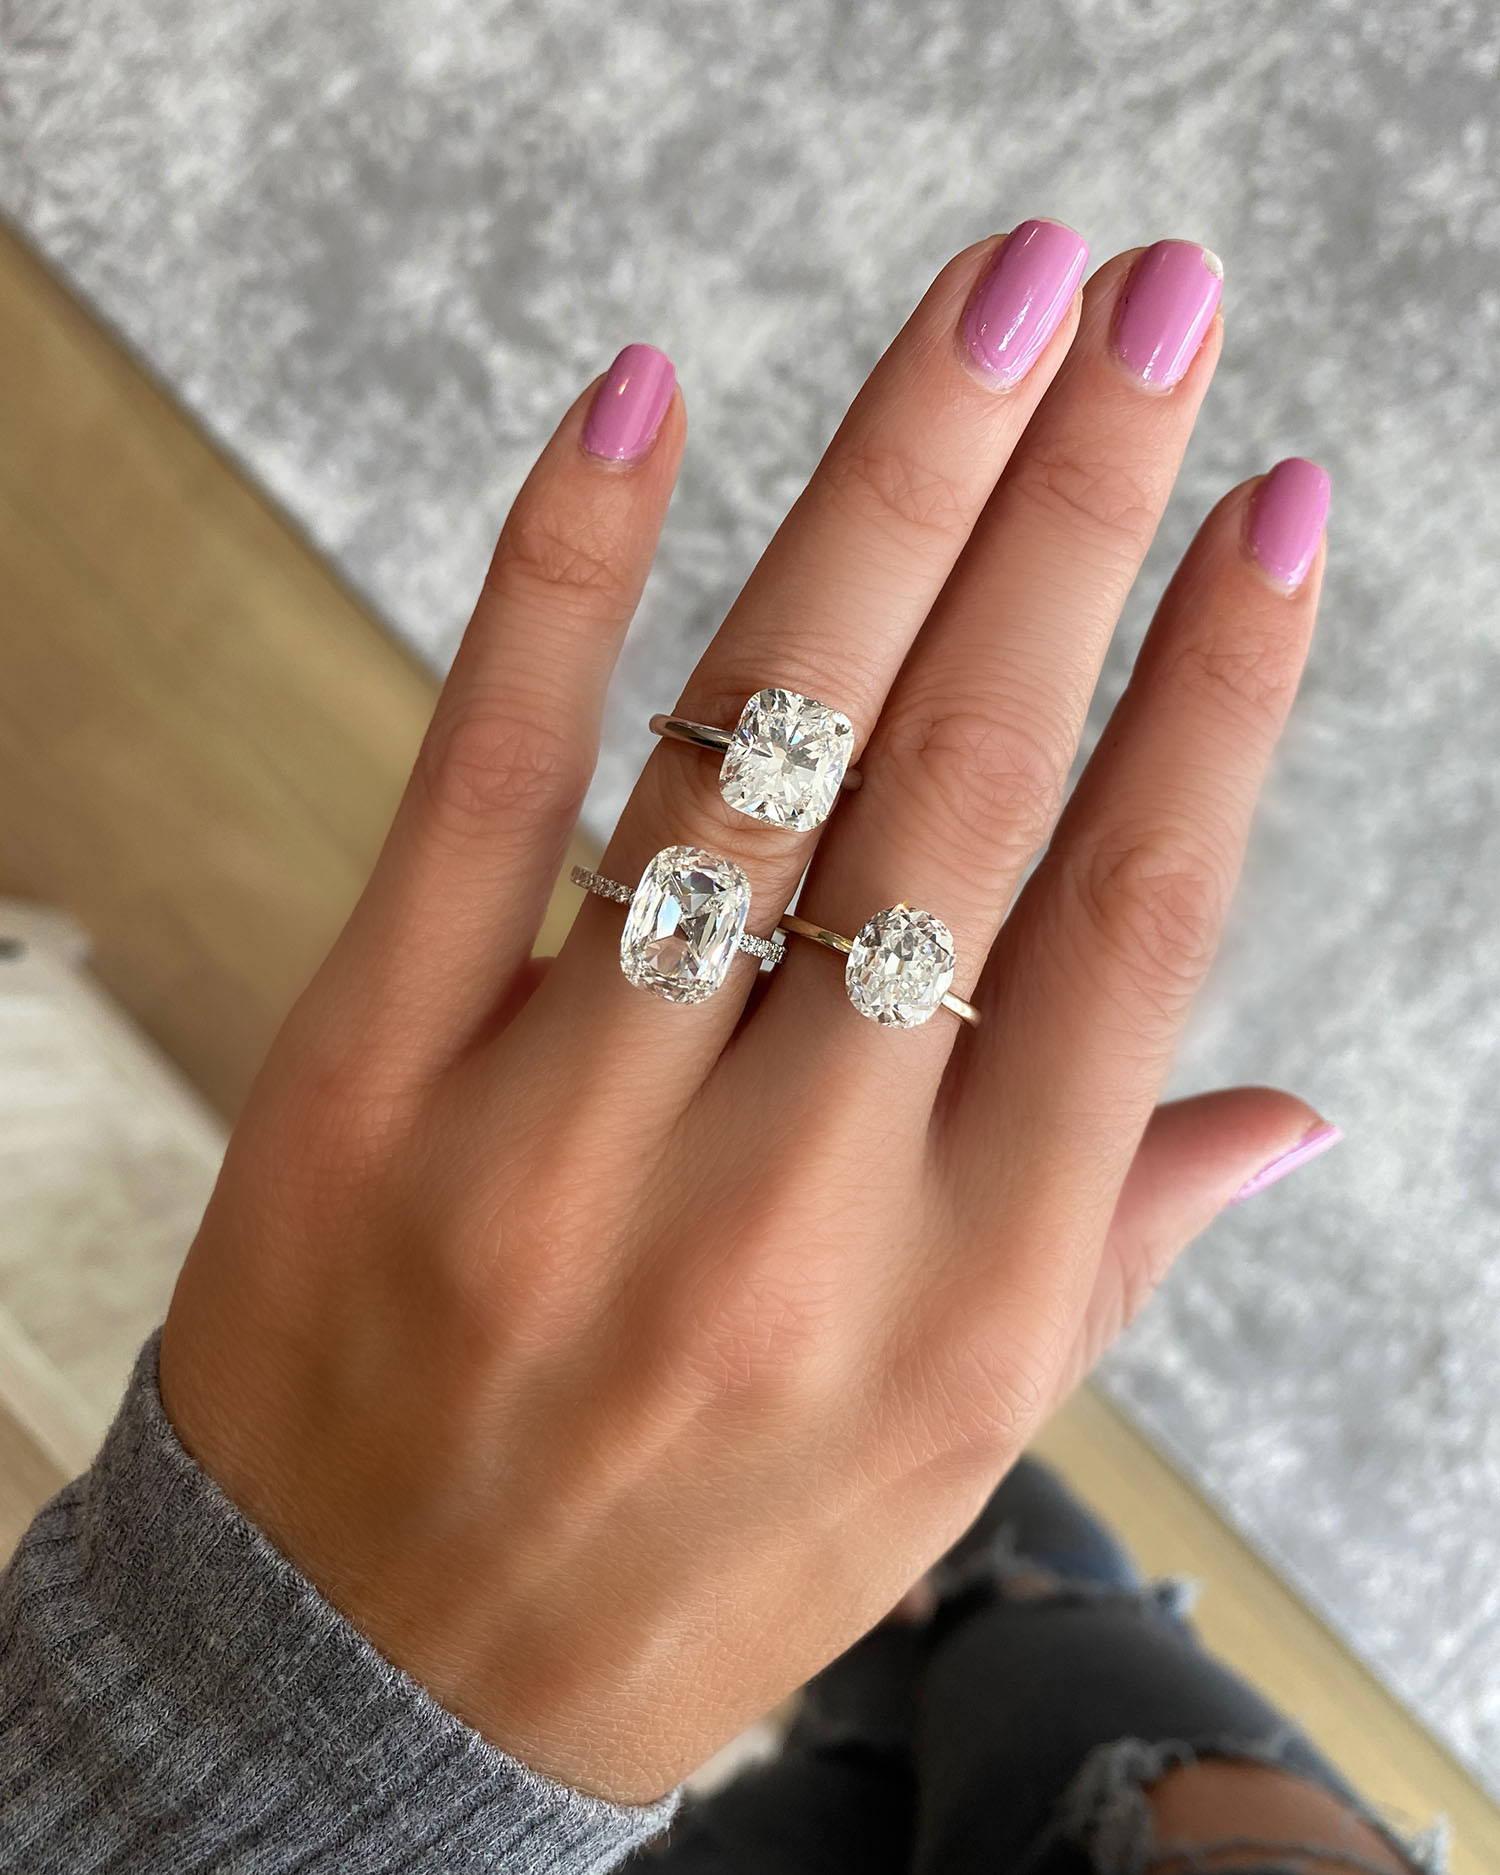 Miss Diamond Ring 3 Carat 4 Carat Radiant Diamond Engagement Ring